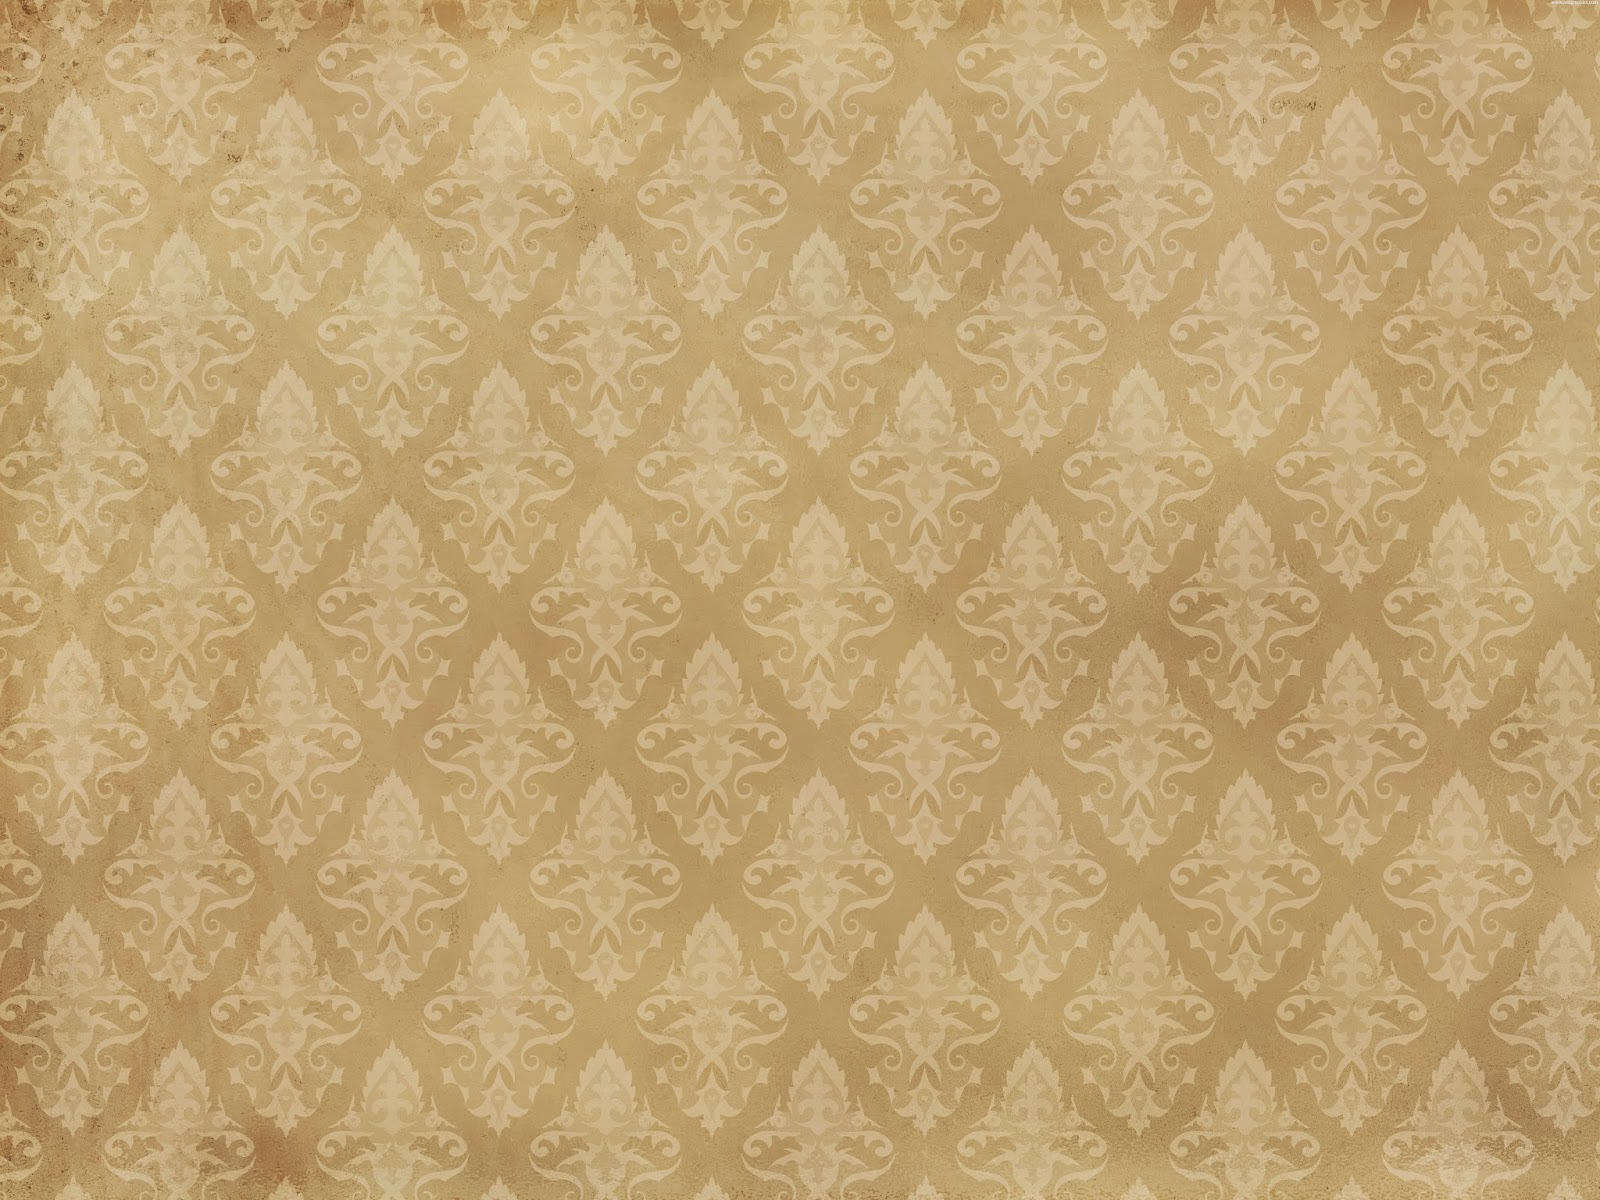 Imagetopia papel vintage fondos for Papel decomural vintage